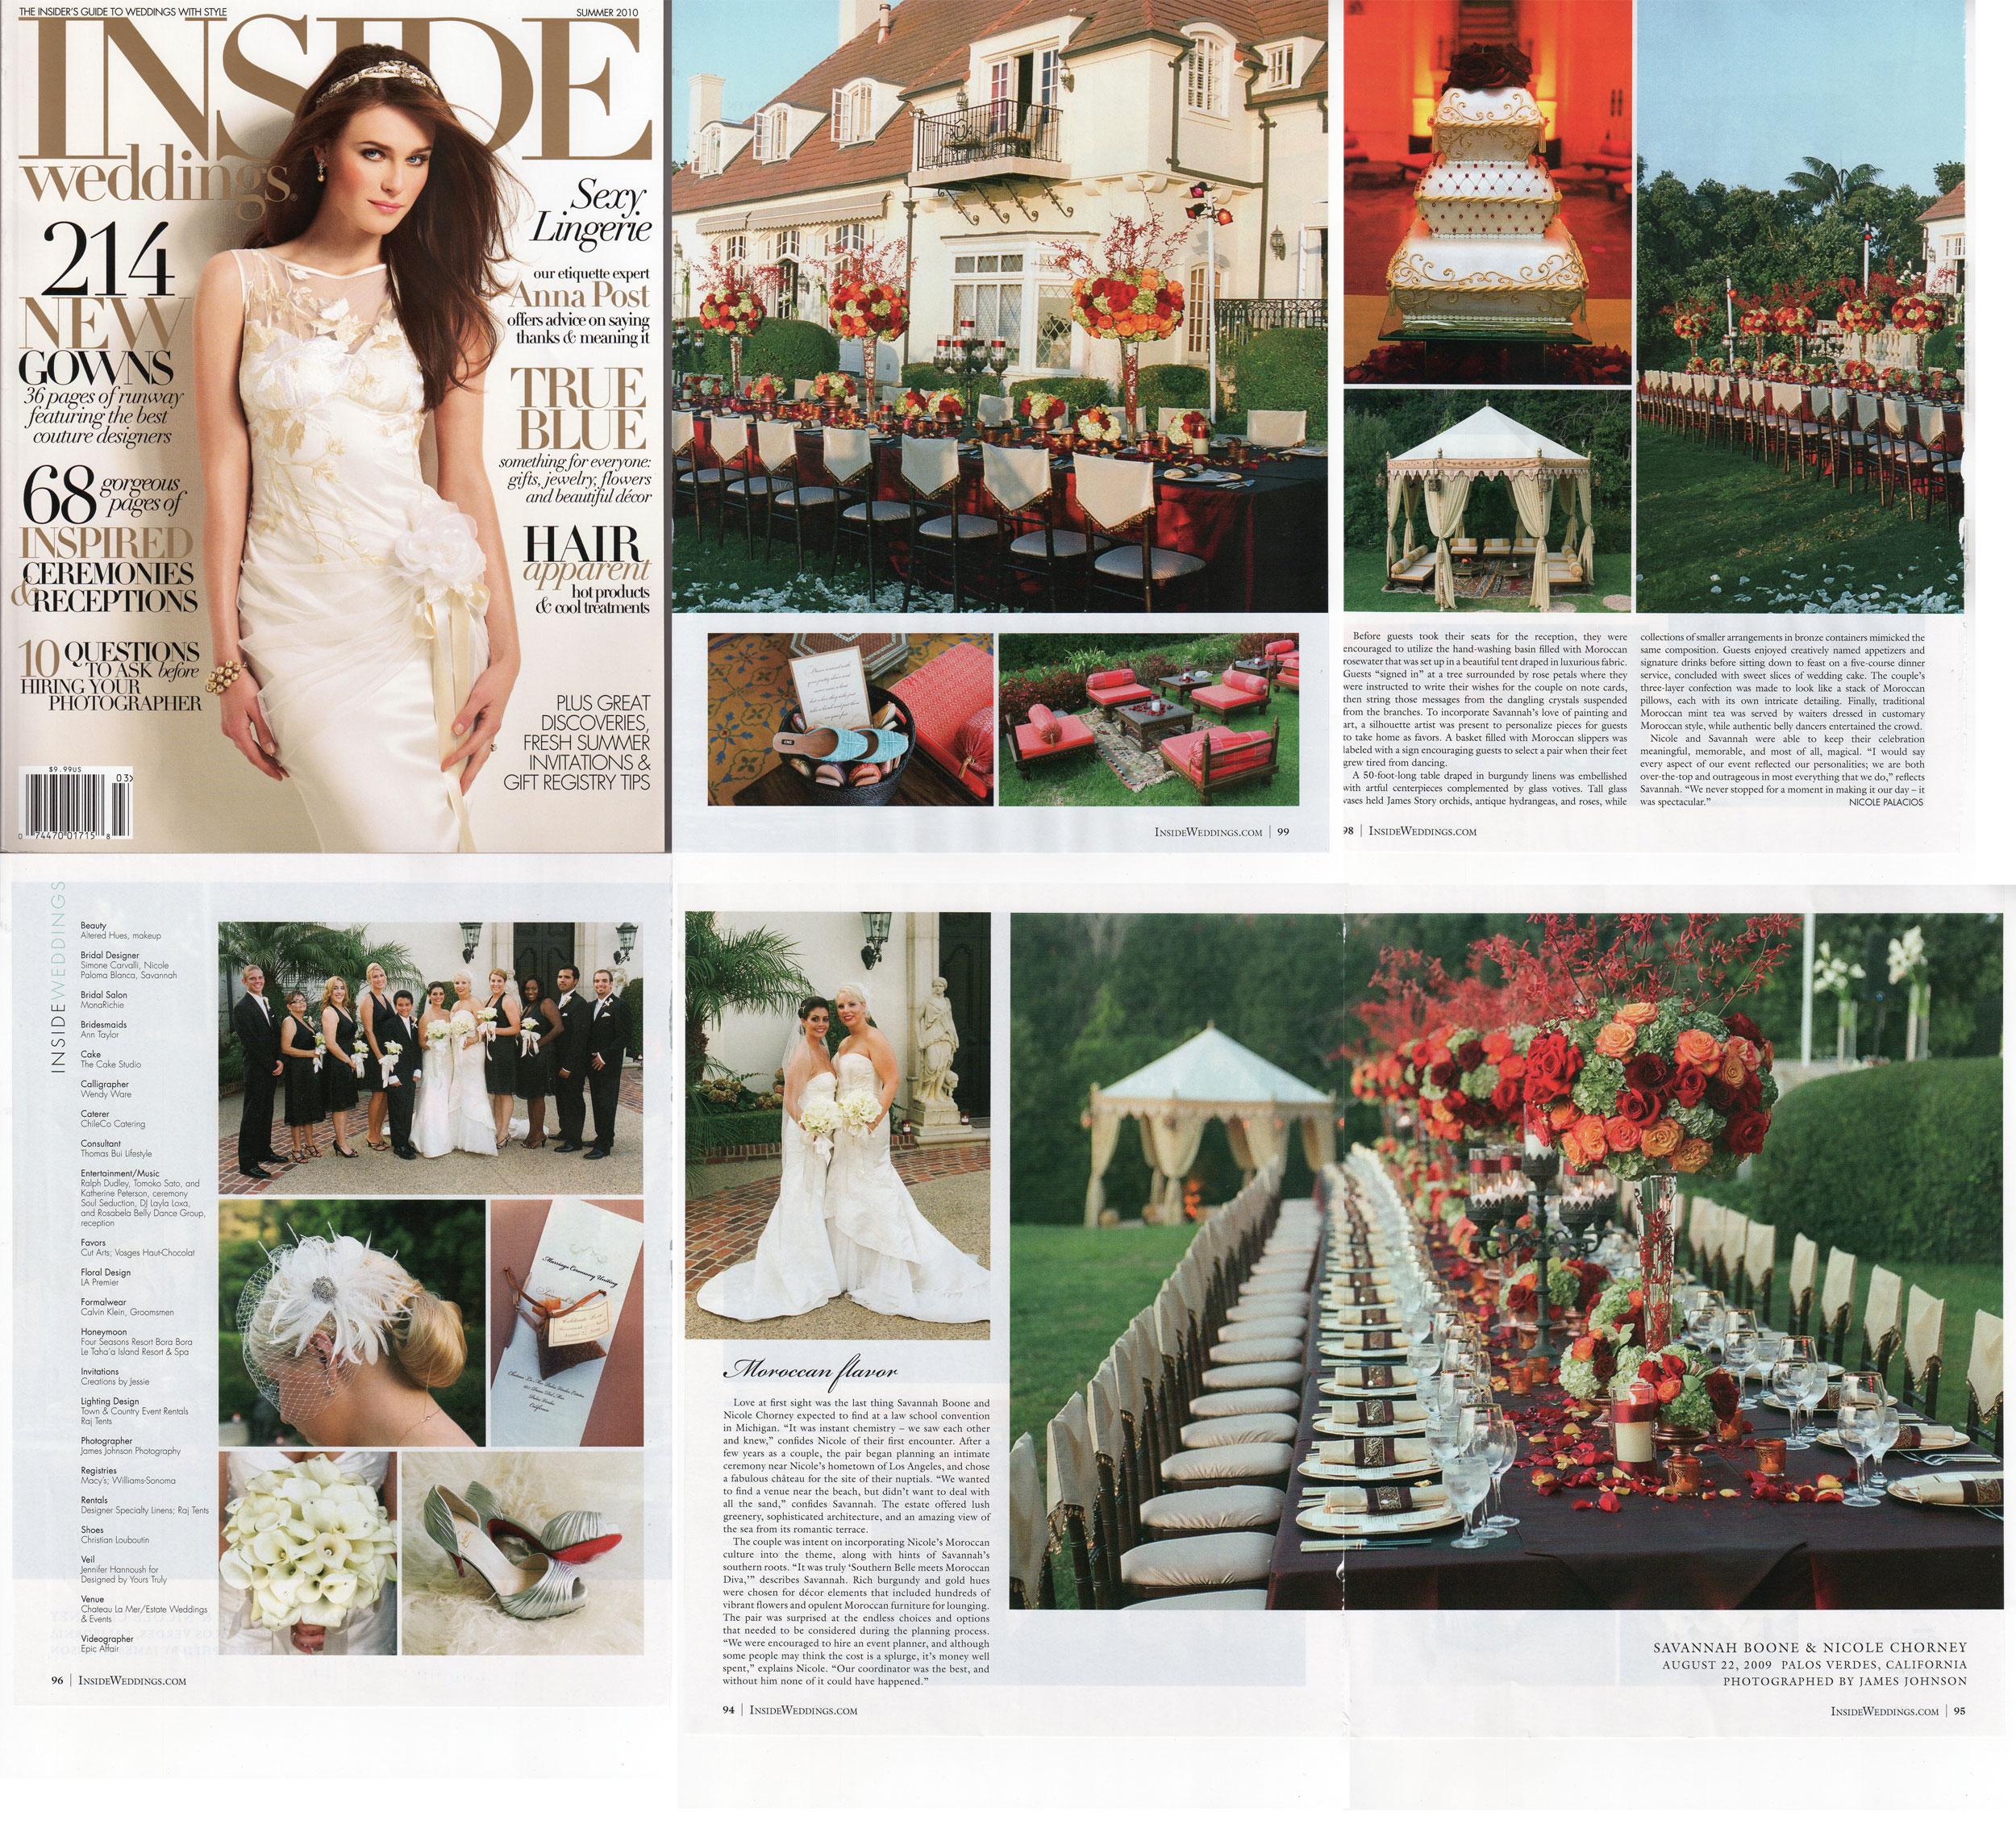 raj-tents-inside-weddings-magazine-2010.jpg